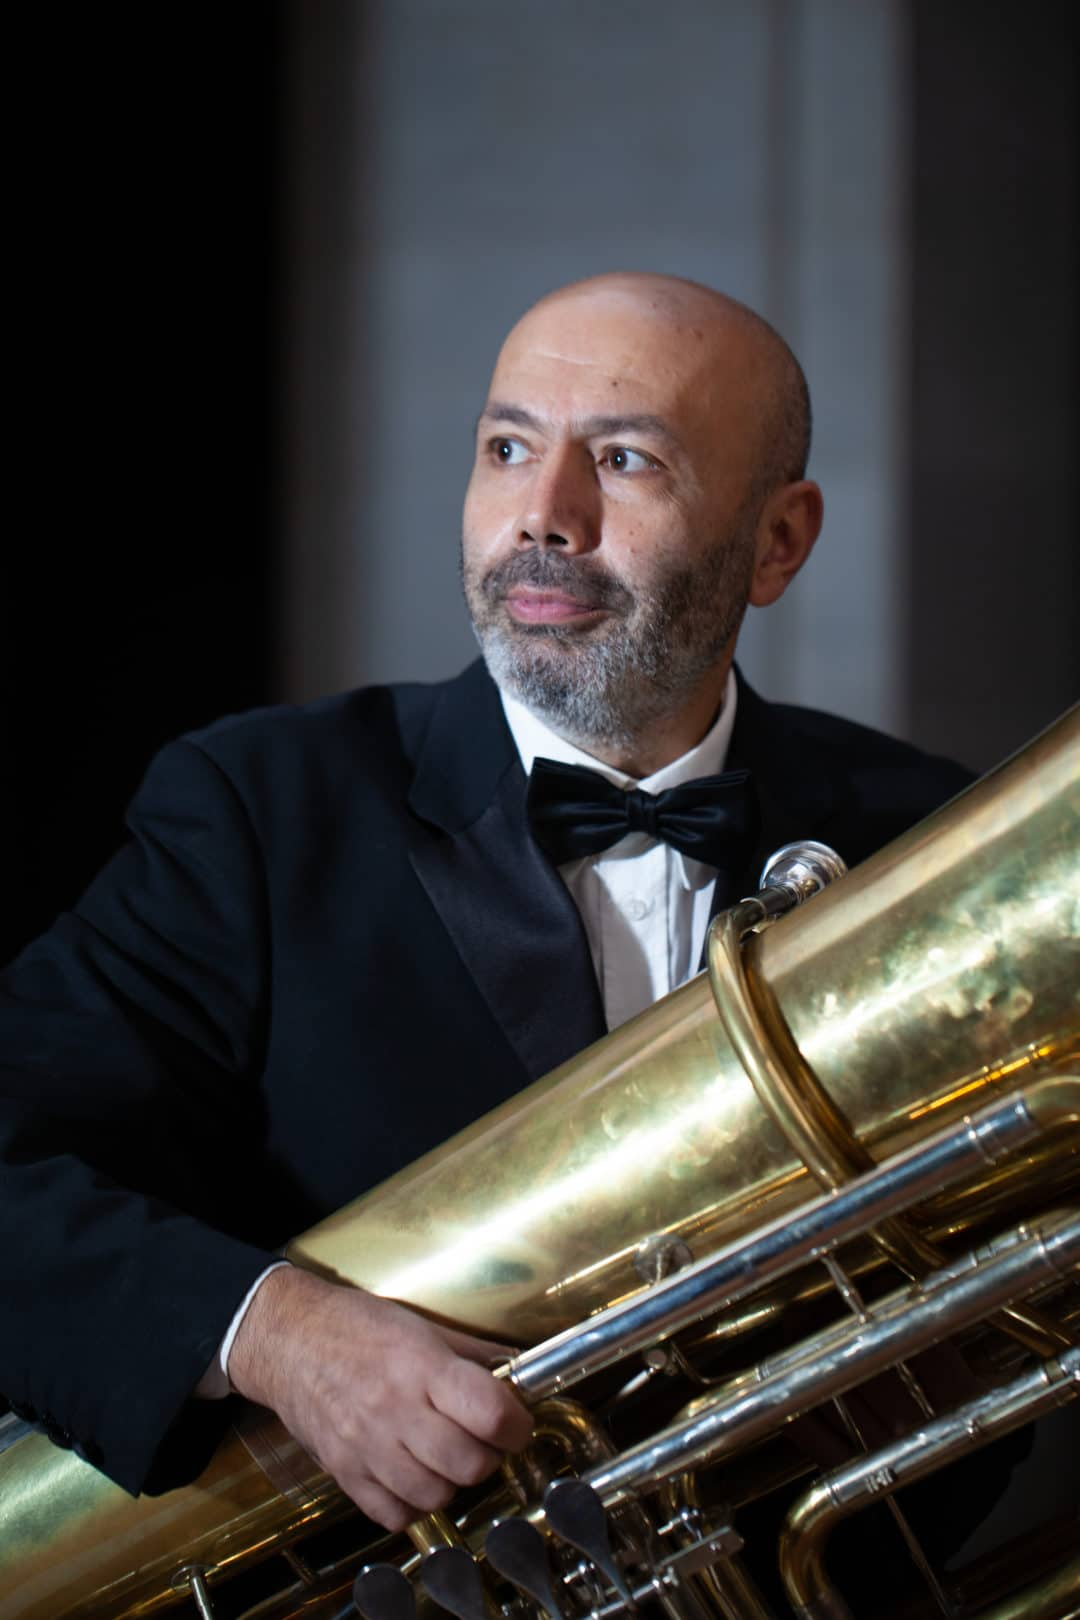 Araik Rubinyan